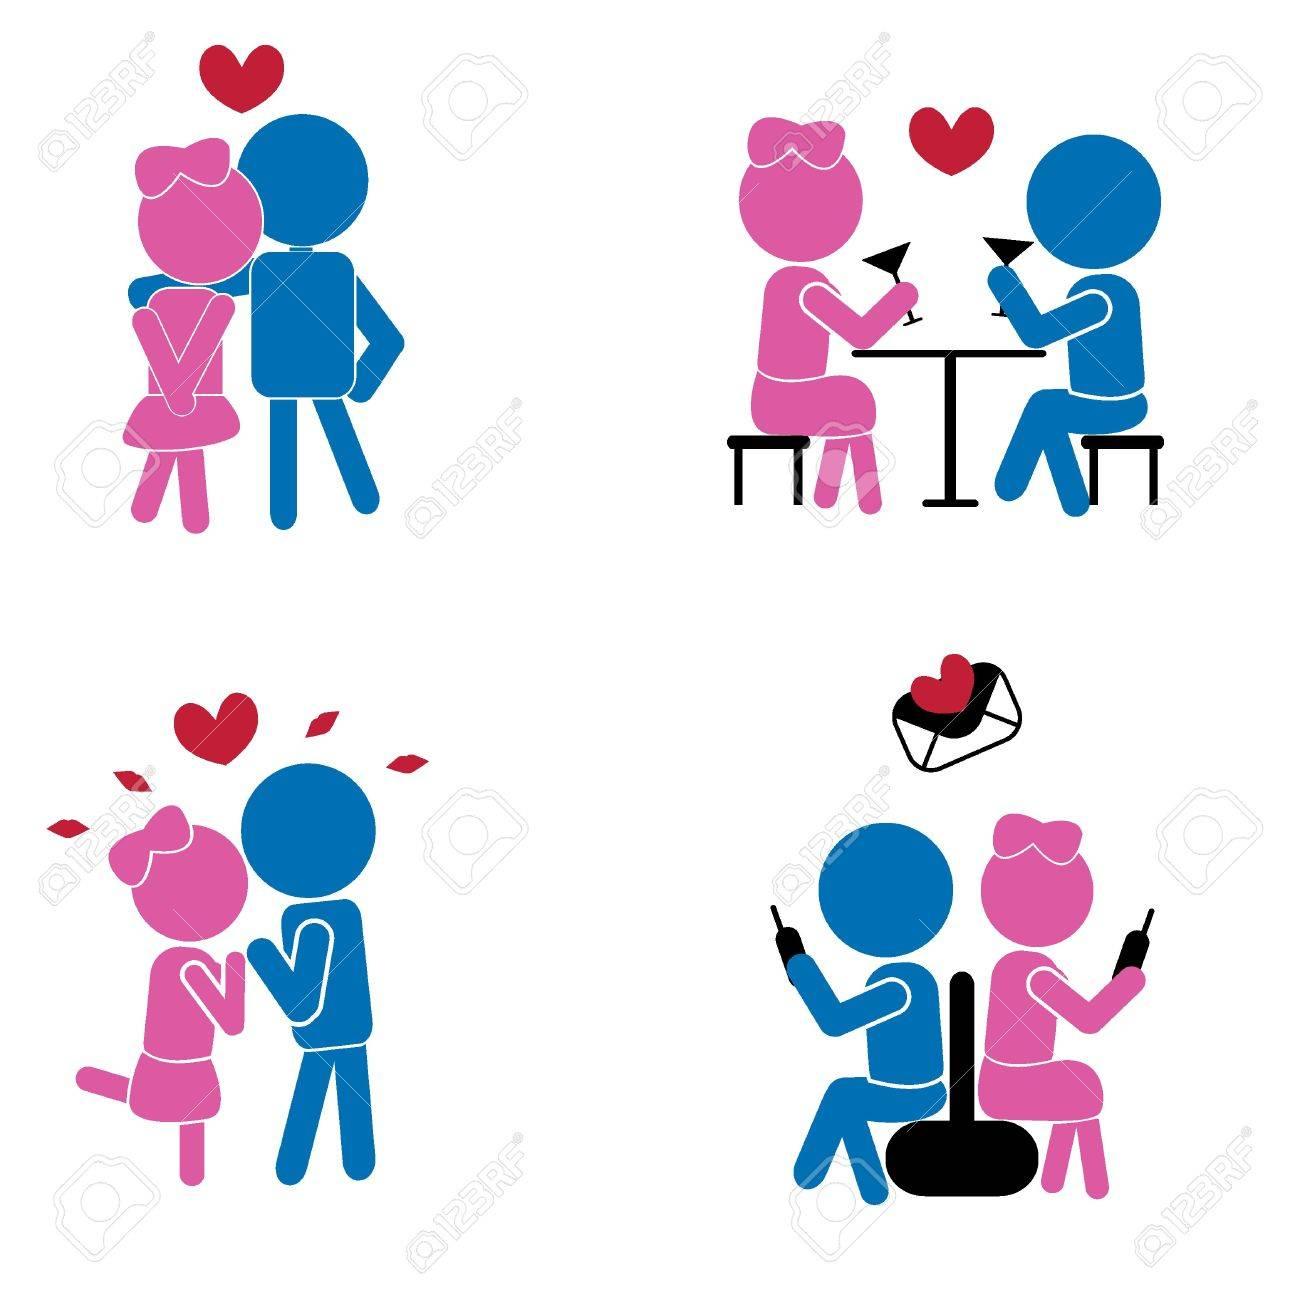 Girl Boy Sticks Love Concept As Symbols Signs Valentine Romance